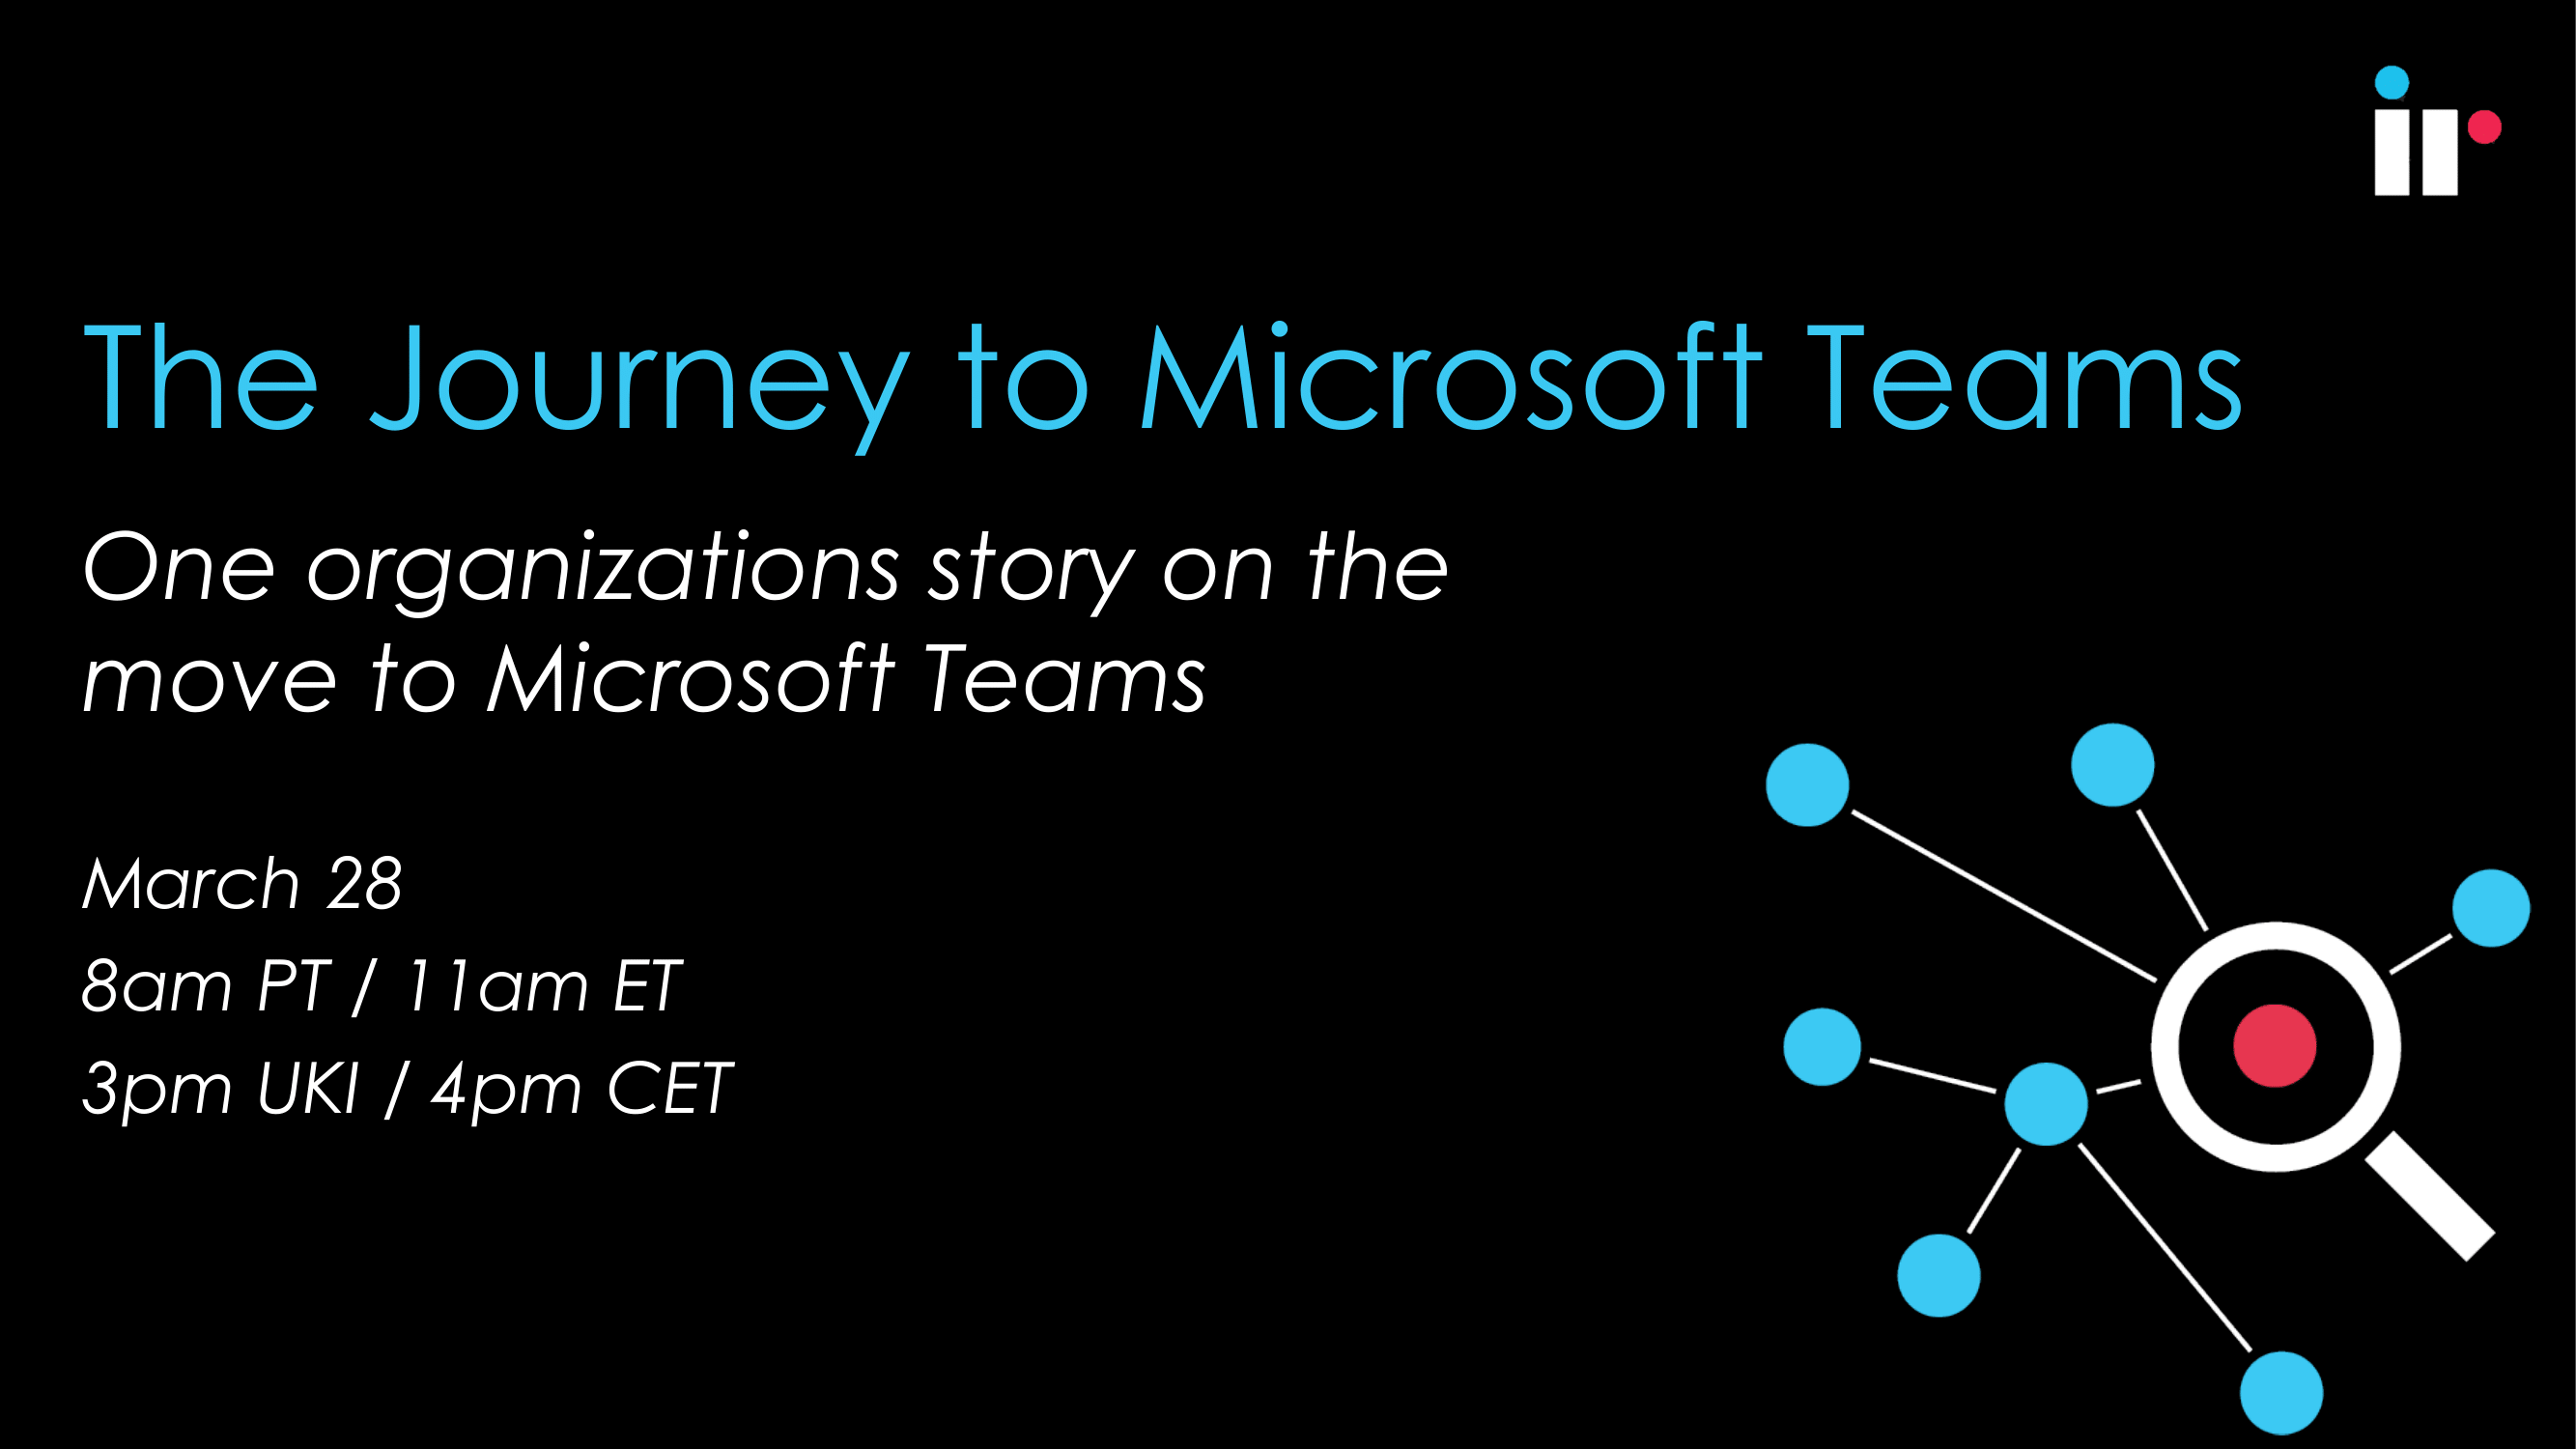 The Journey to Microsoft Teams Webinar